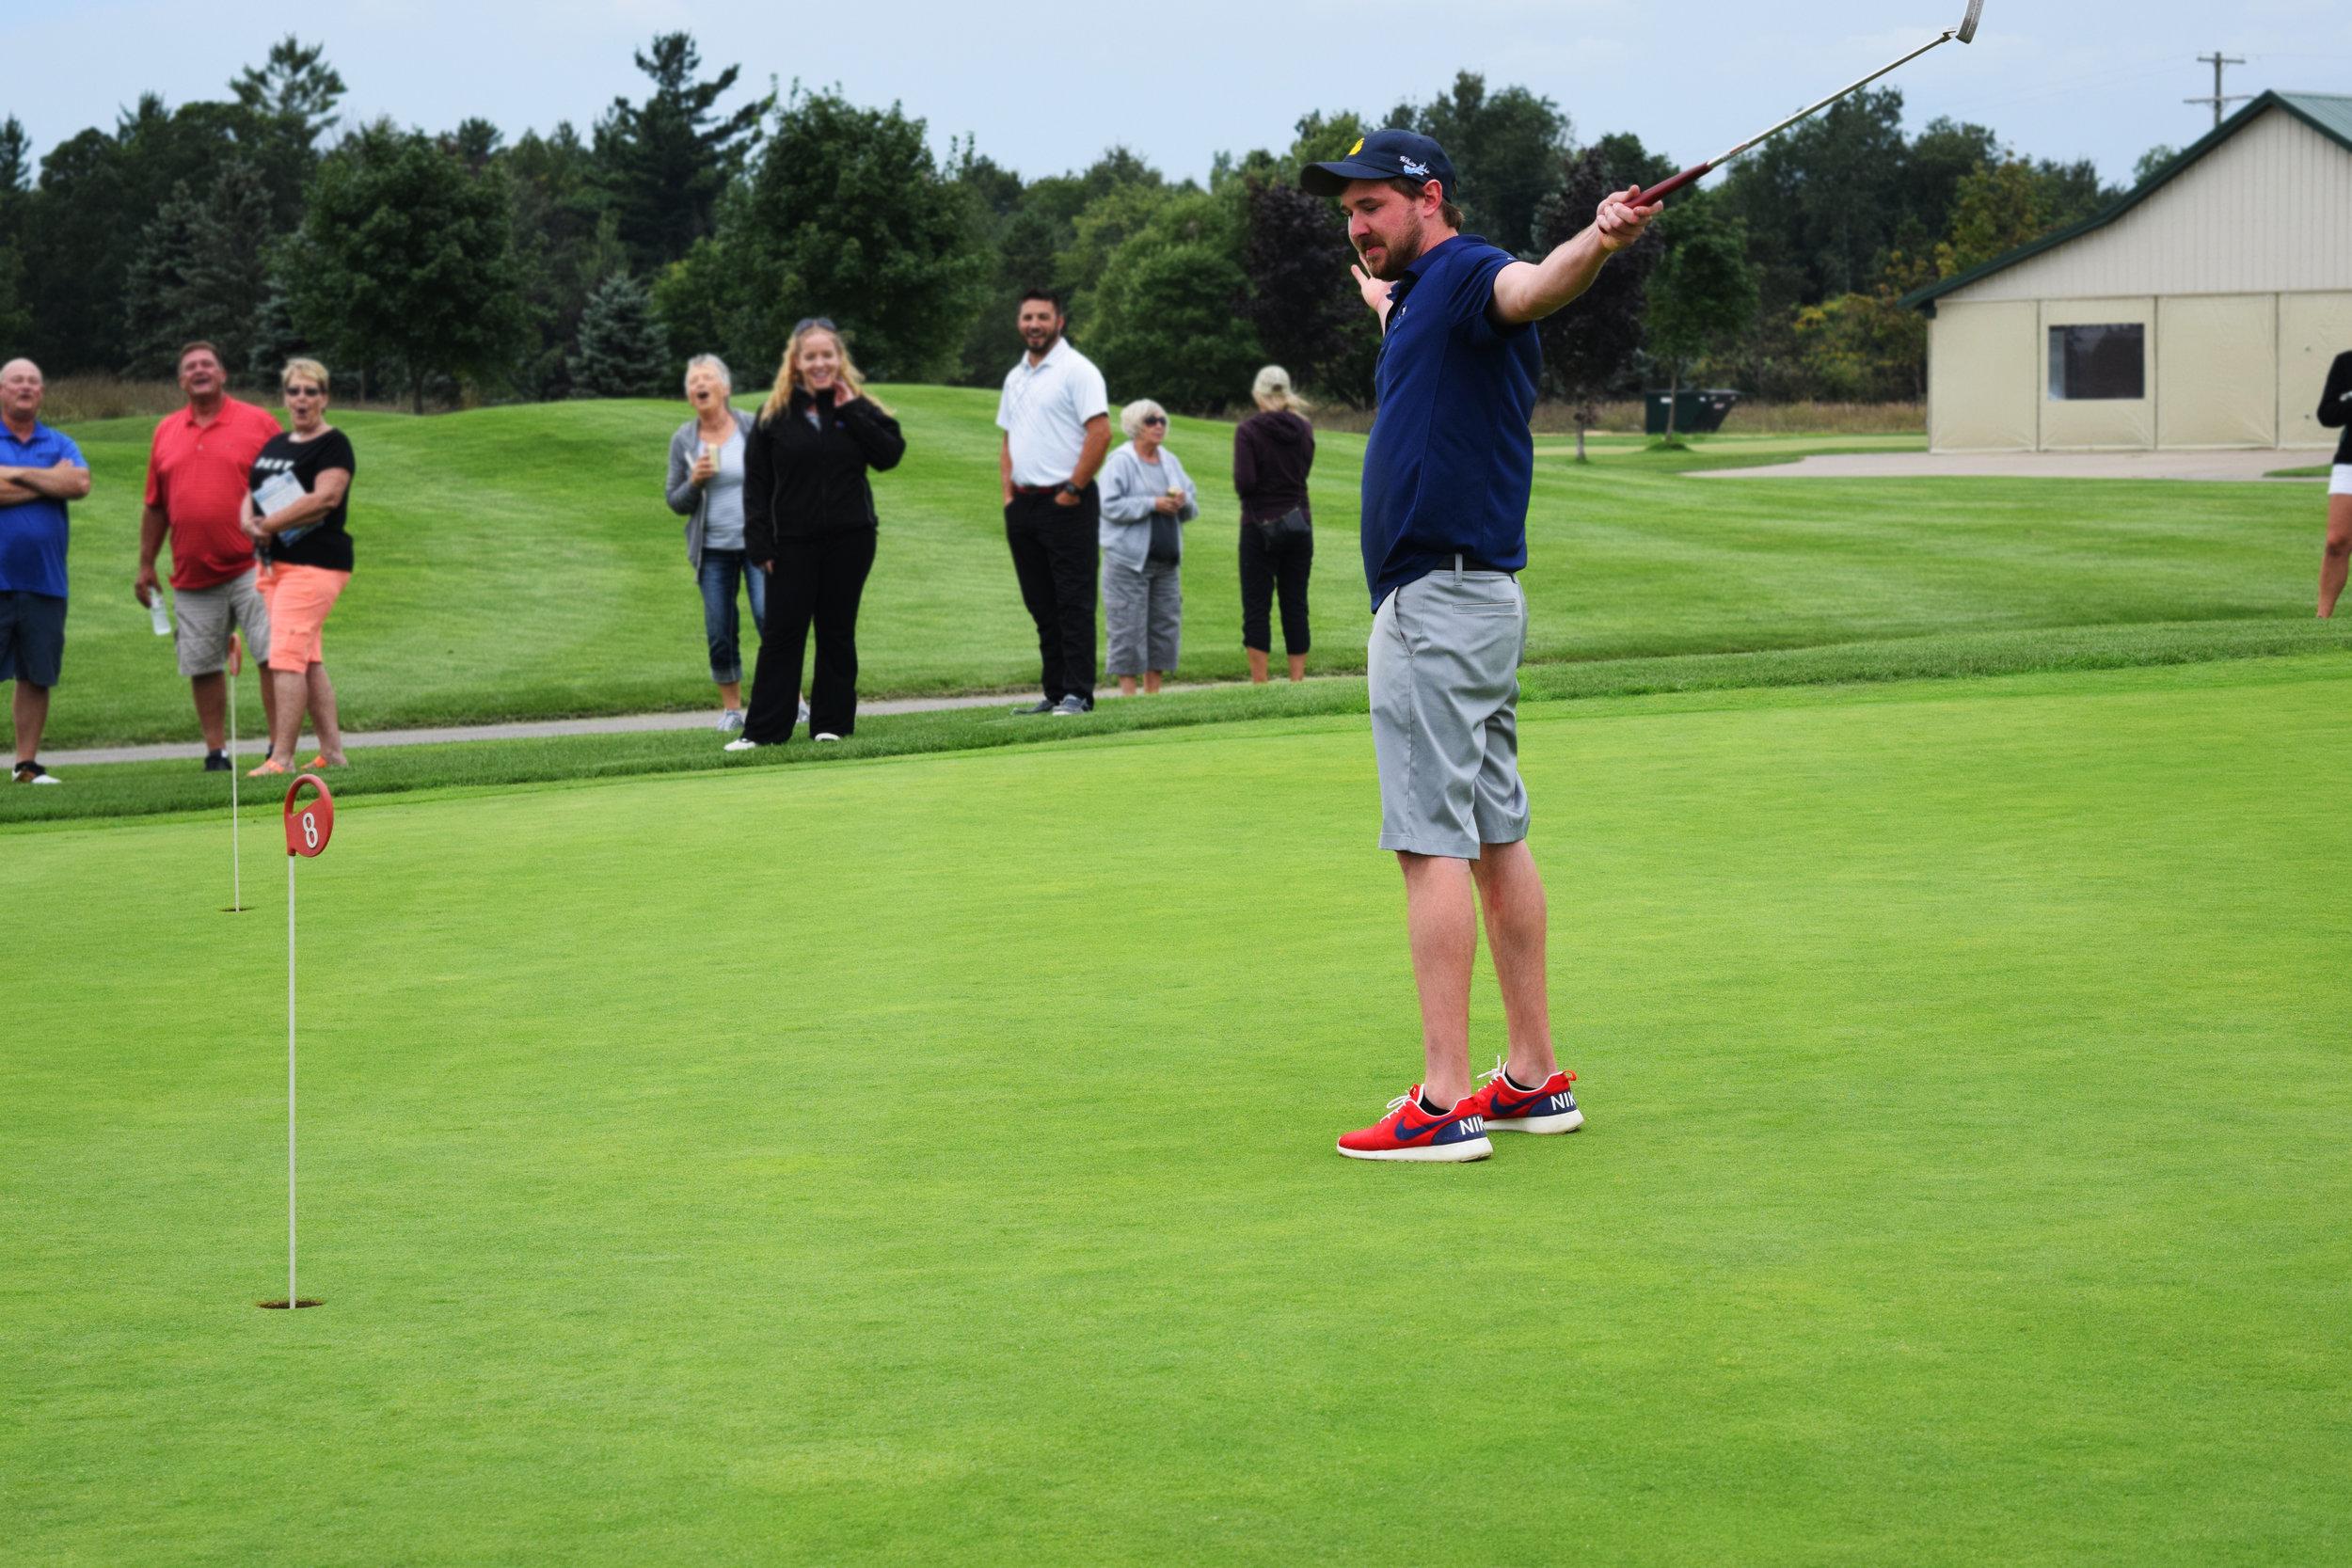 The winning putt!